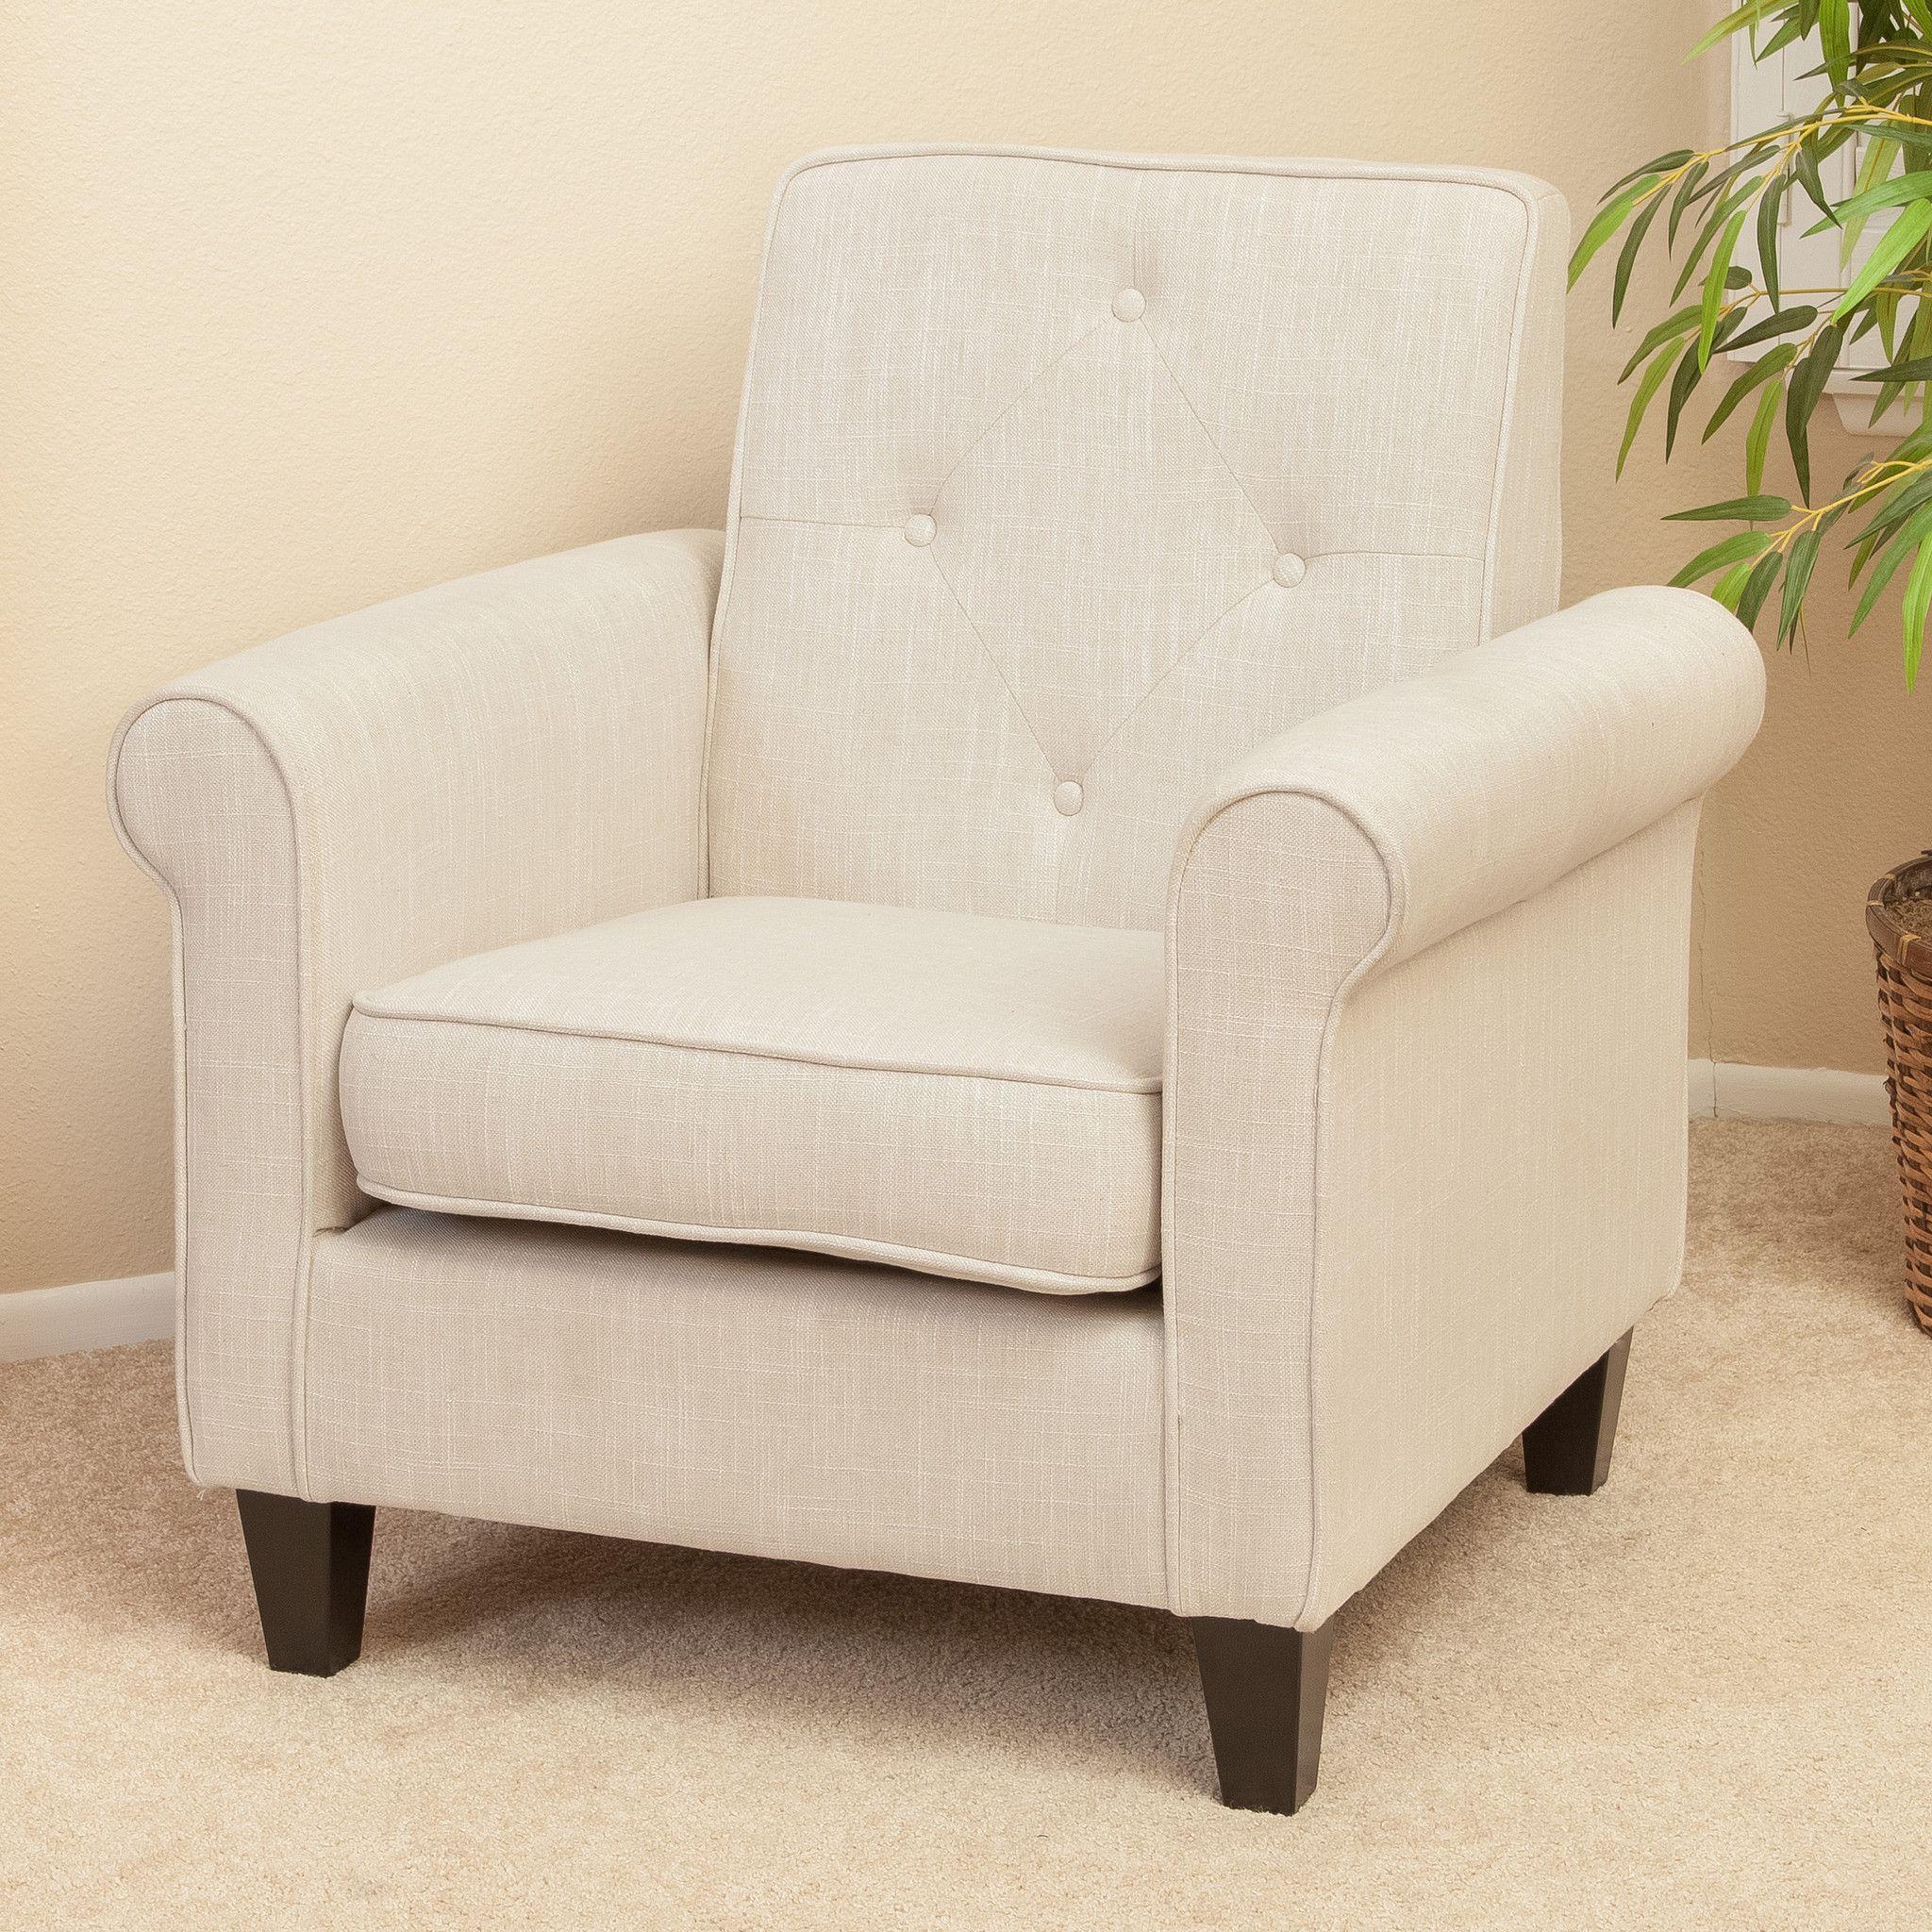 Barzini Light Beige Fabric Club Chair | REDO FURNITURE | Pinterest ...